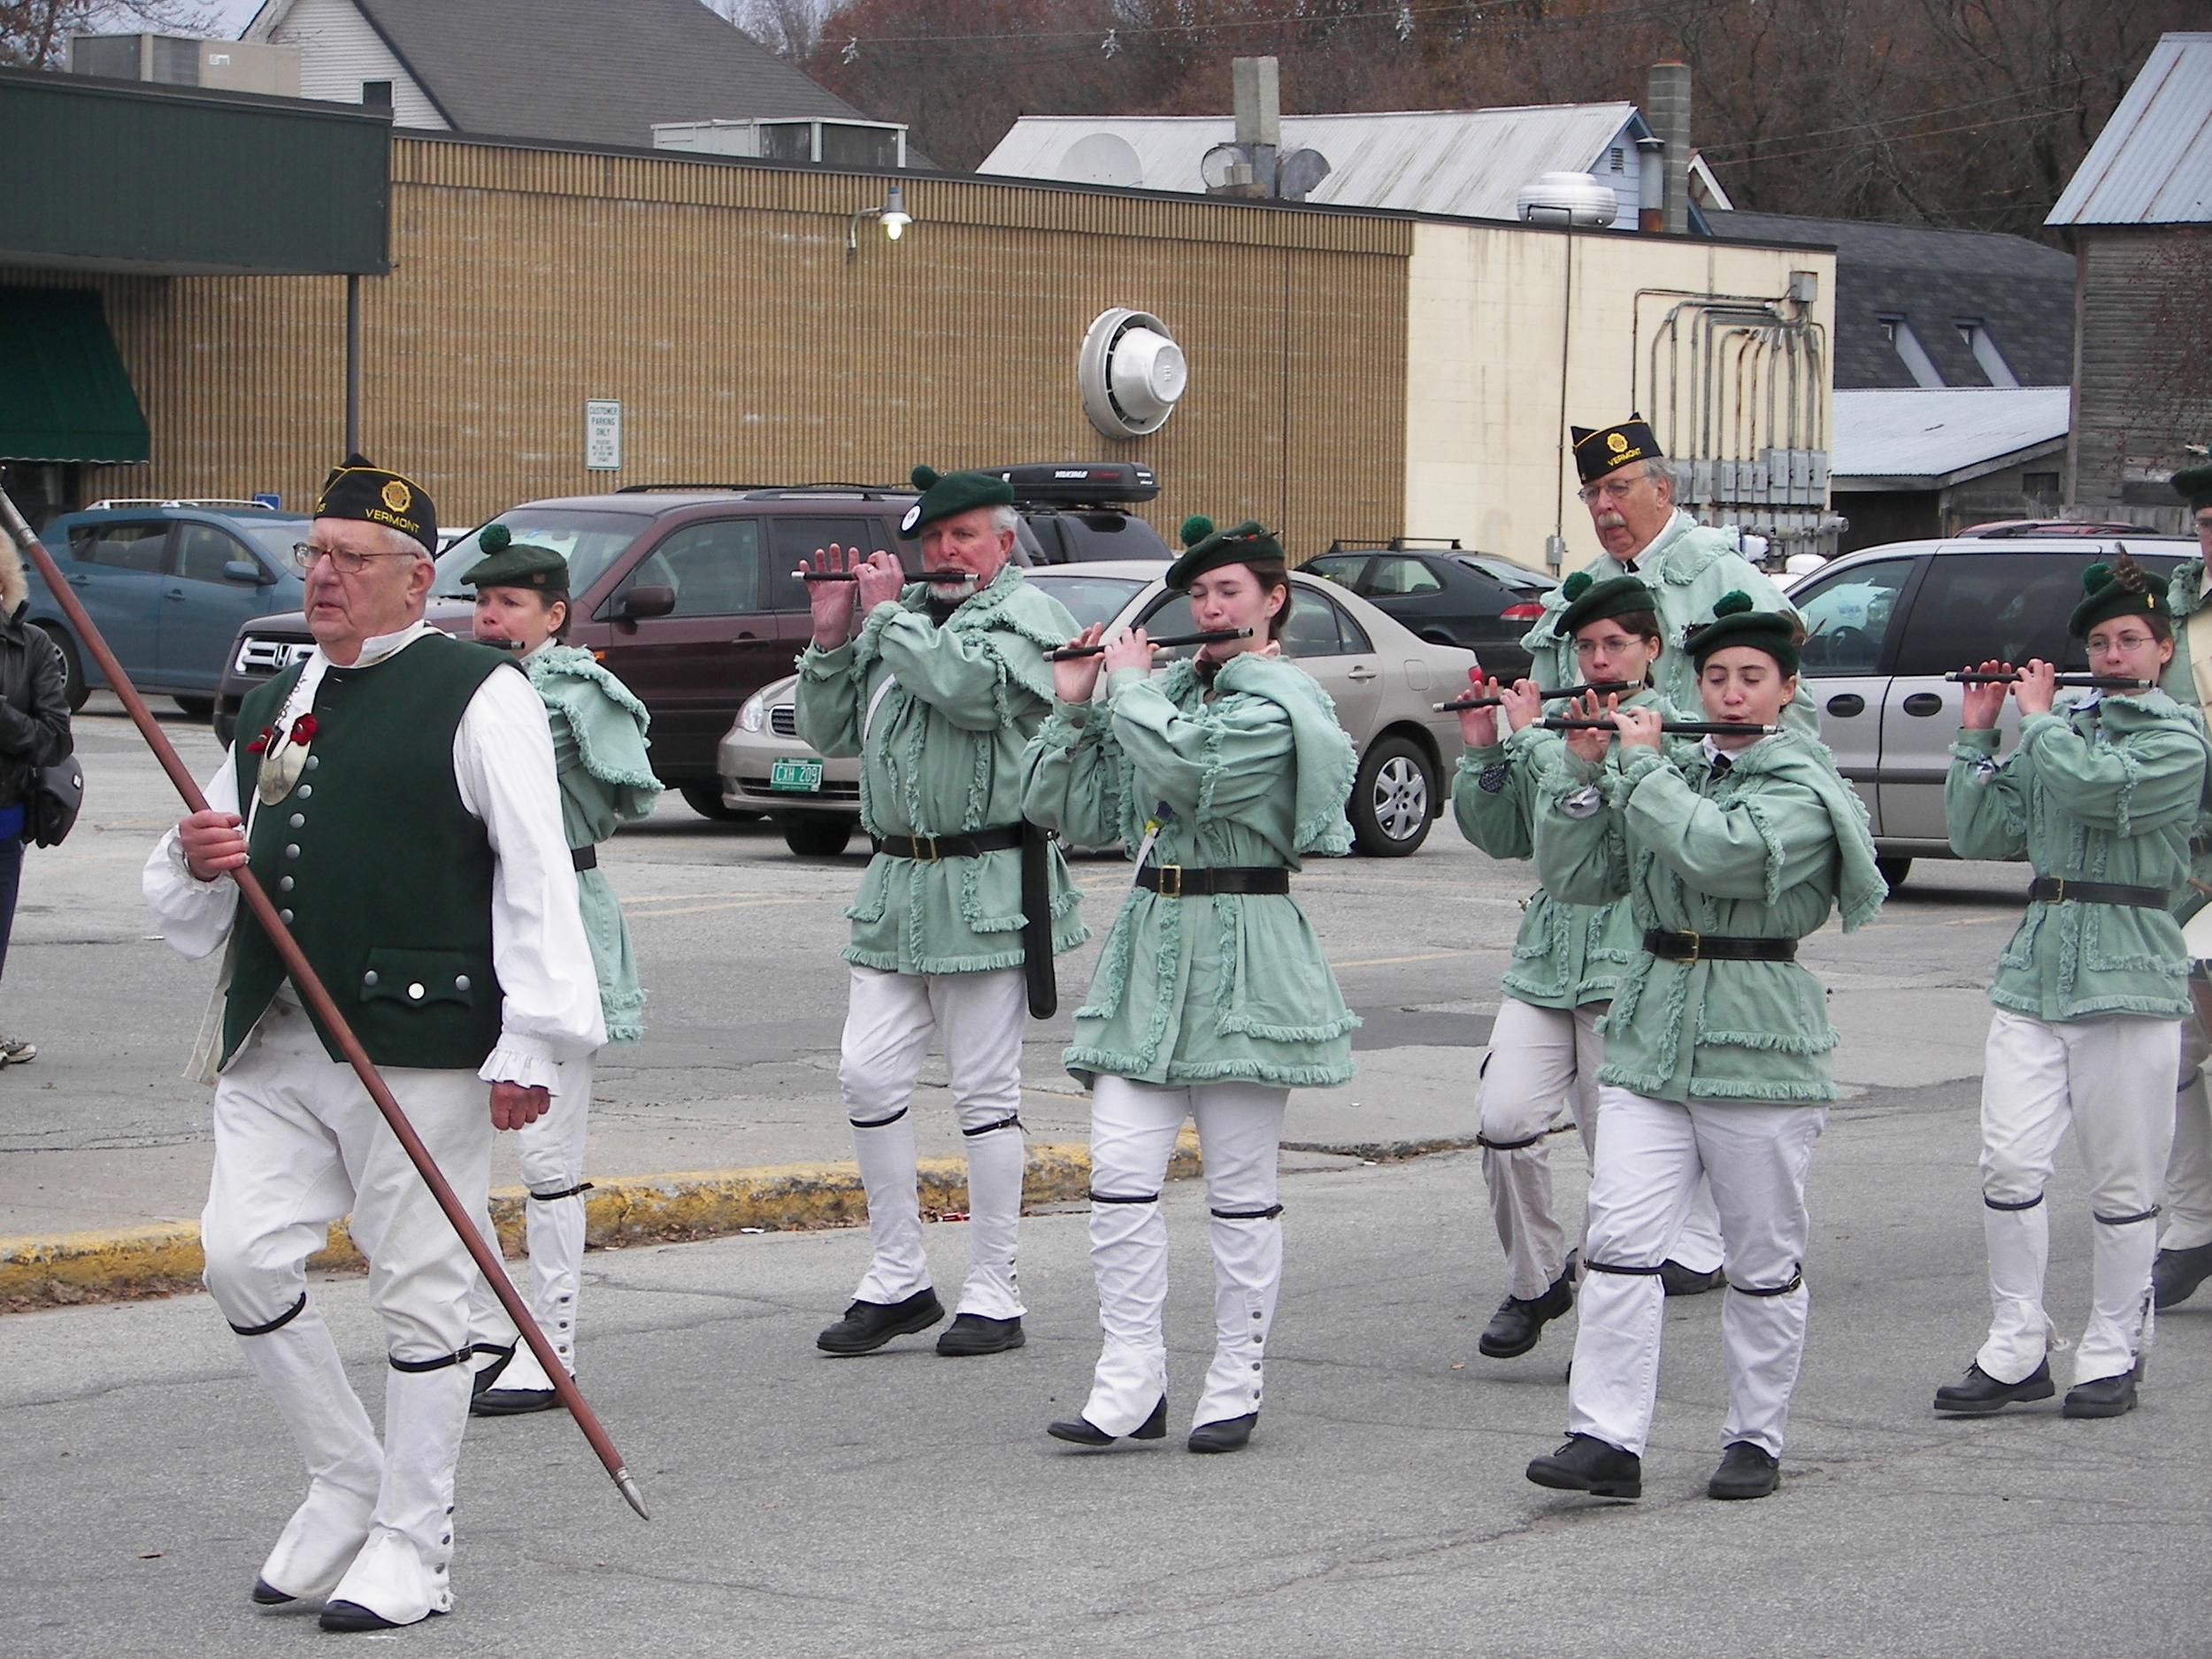 Vetran's Day Parade - 2009